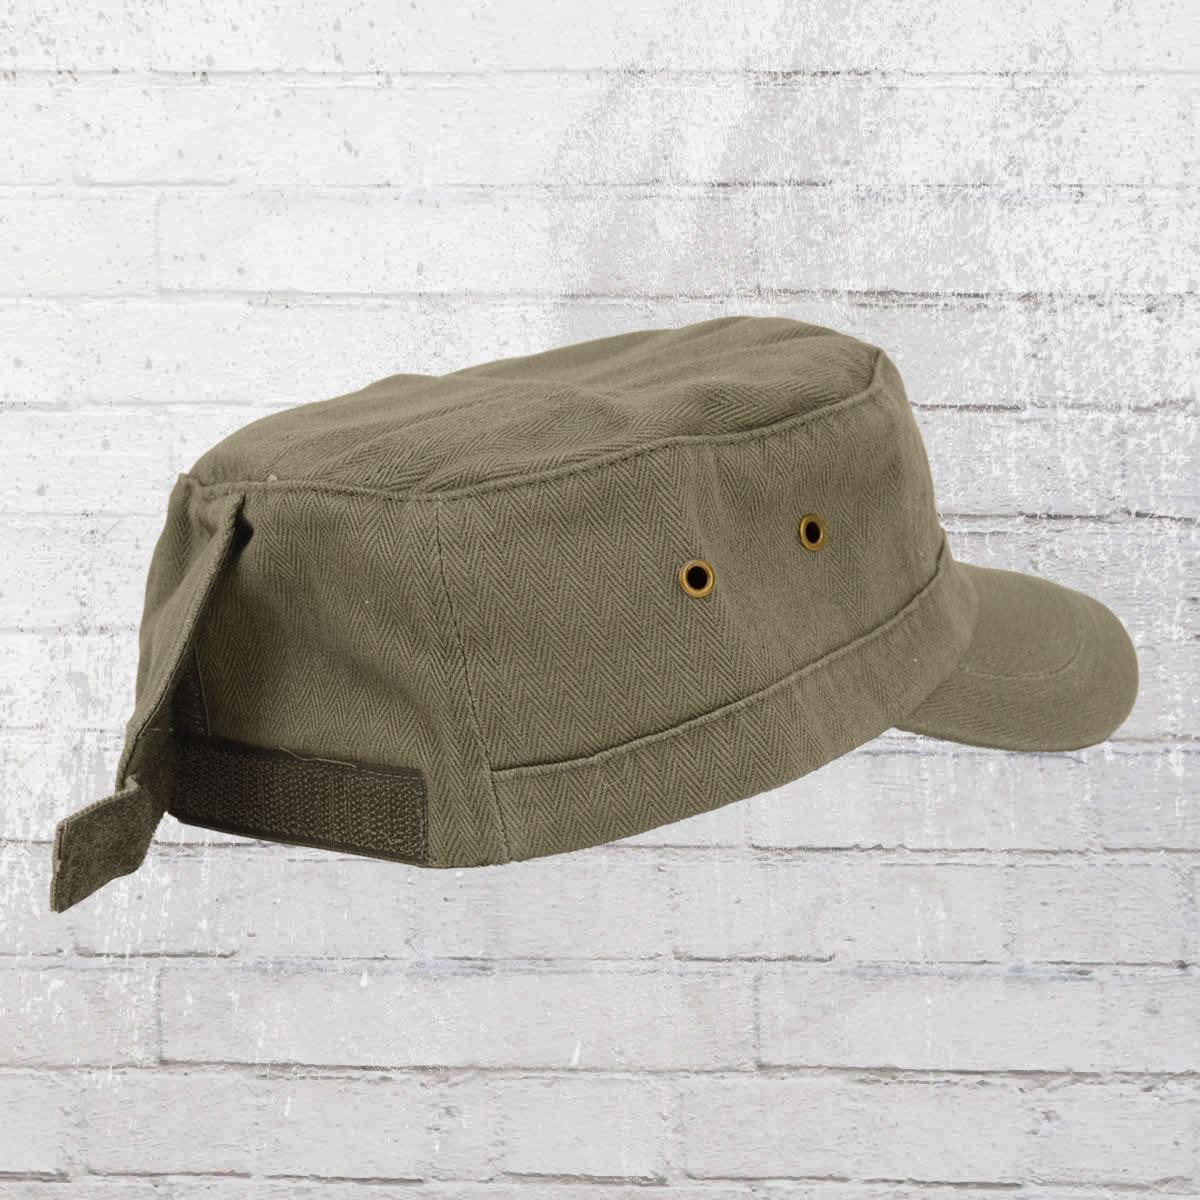 05d8ae7cc3 Order now | Beechfield Bonnet Urban Army Cap green